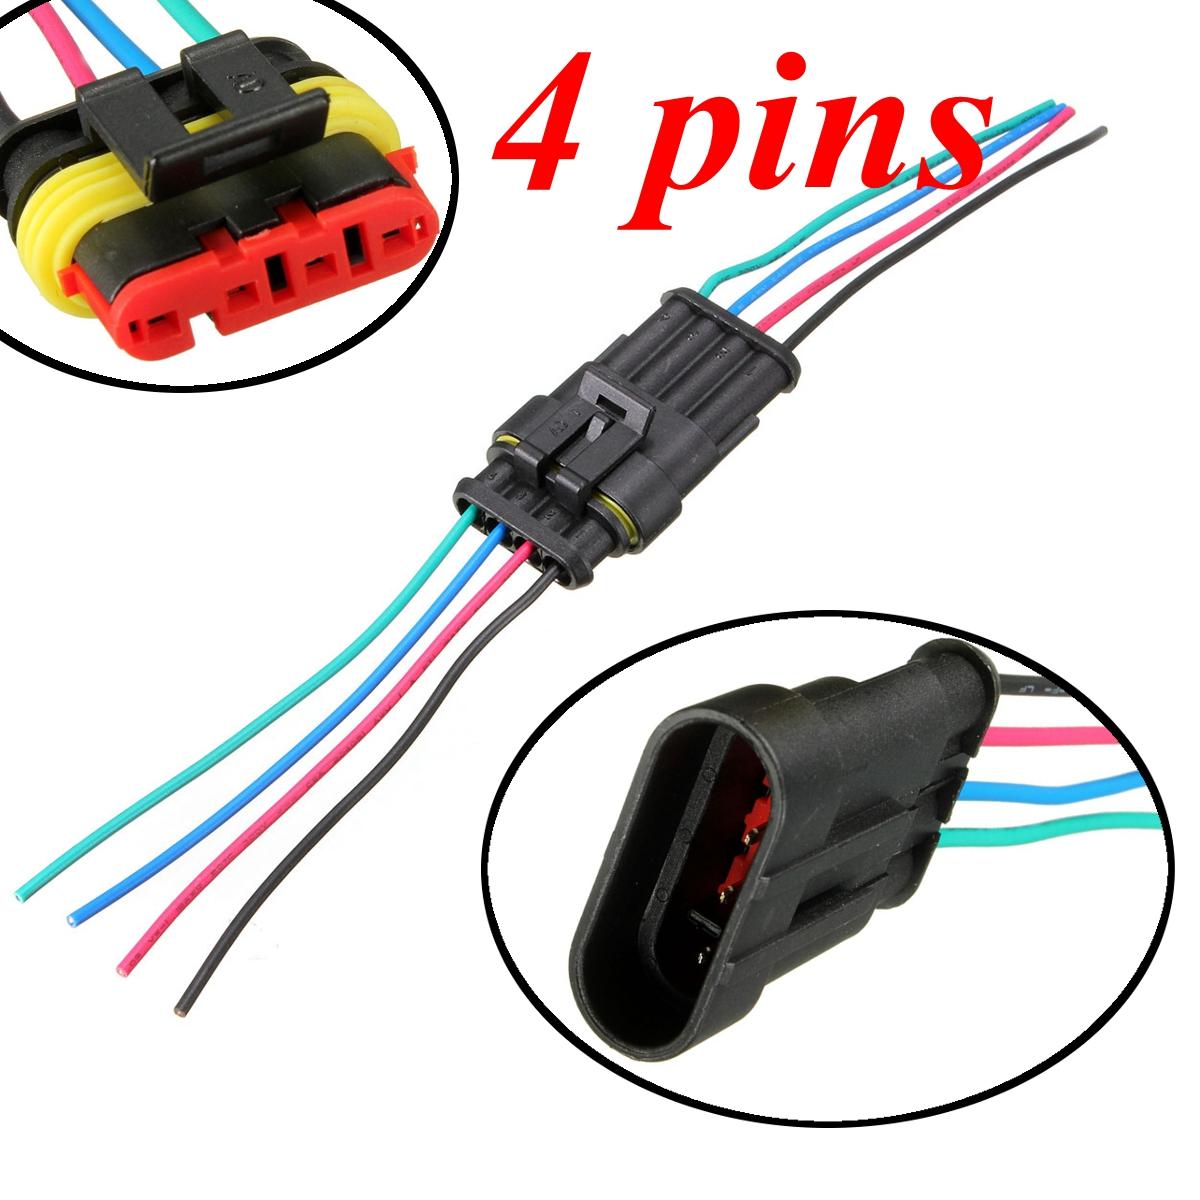 1/2/3/4/5/6 Pin Waterproof Car Motorcycles Electrical Connector Plug ...